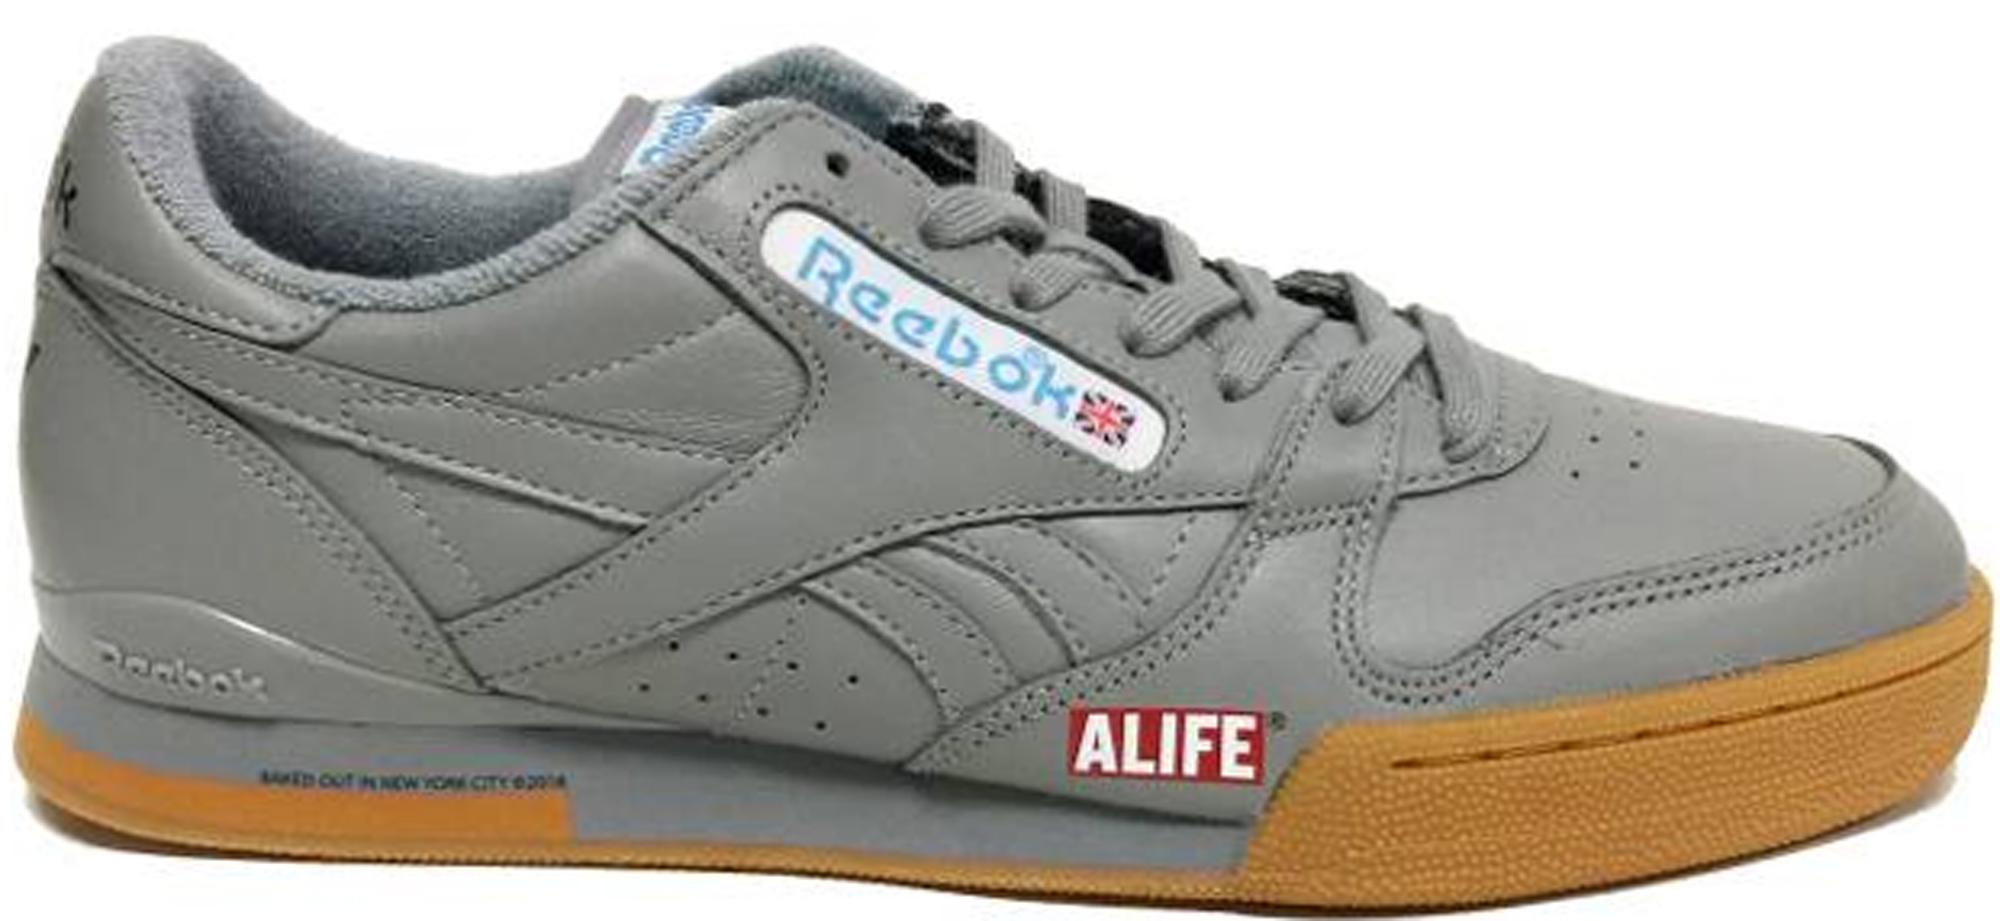 Reebok Phase 1 Pro Alife Grey